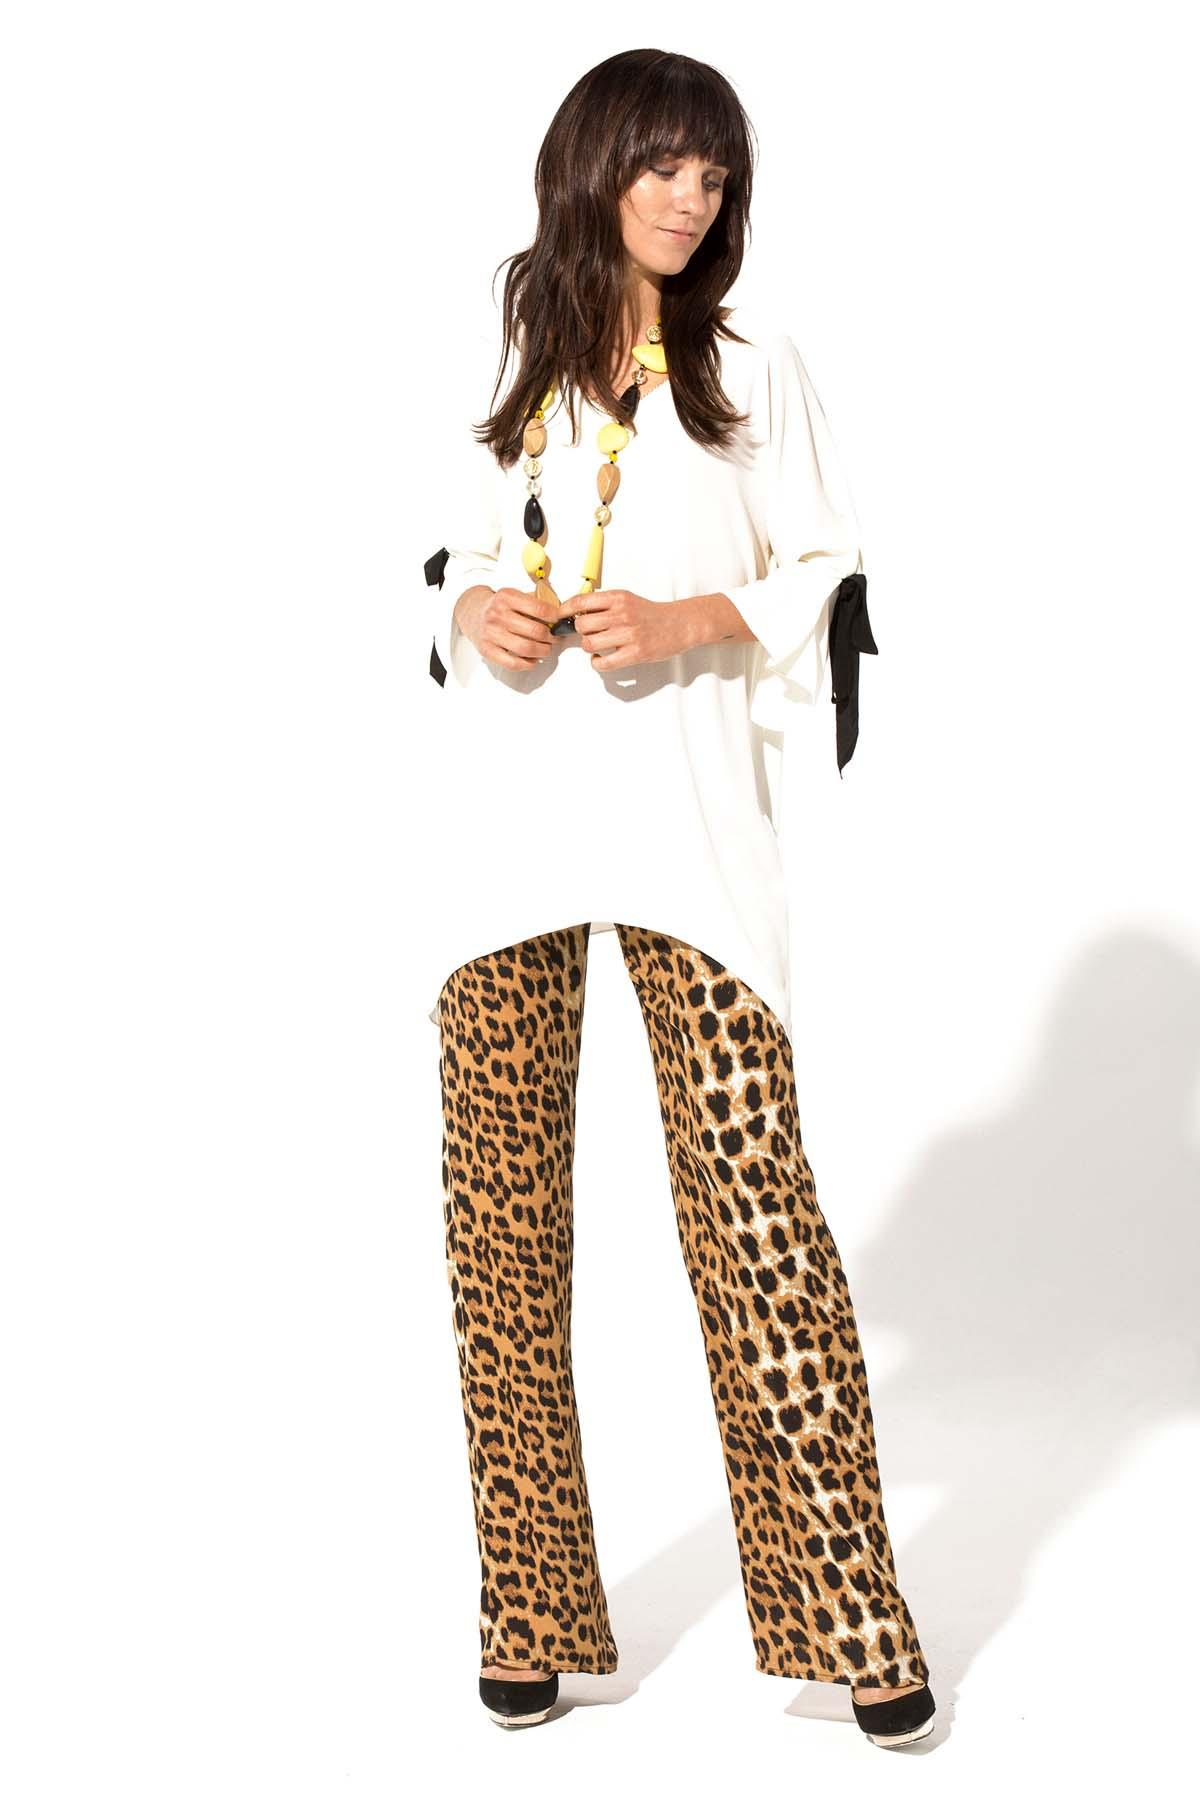 Teria Yabar - Pantalón animal print